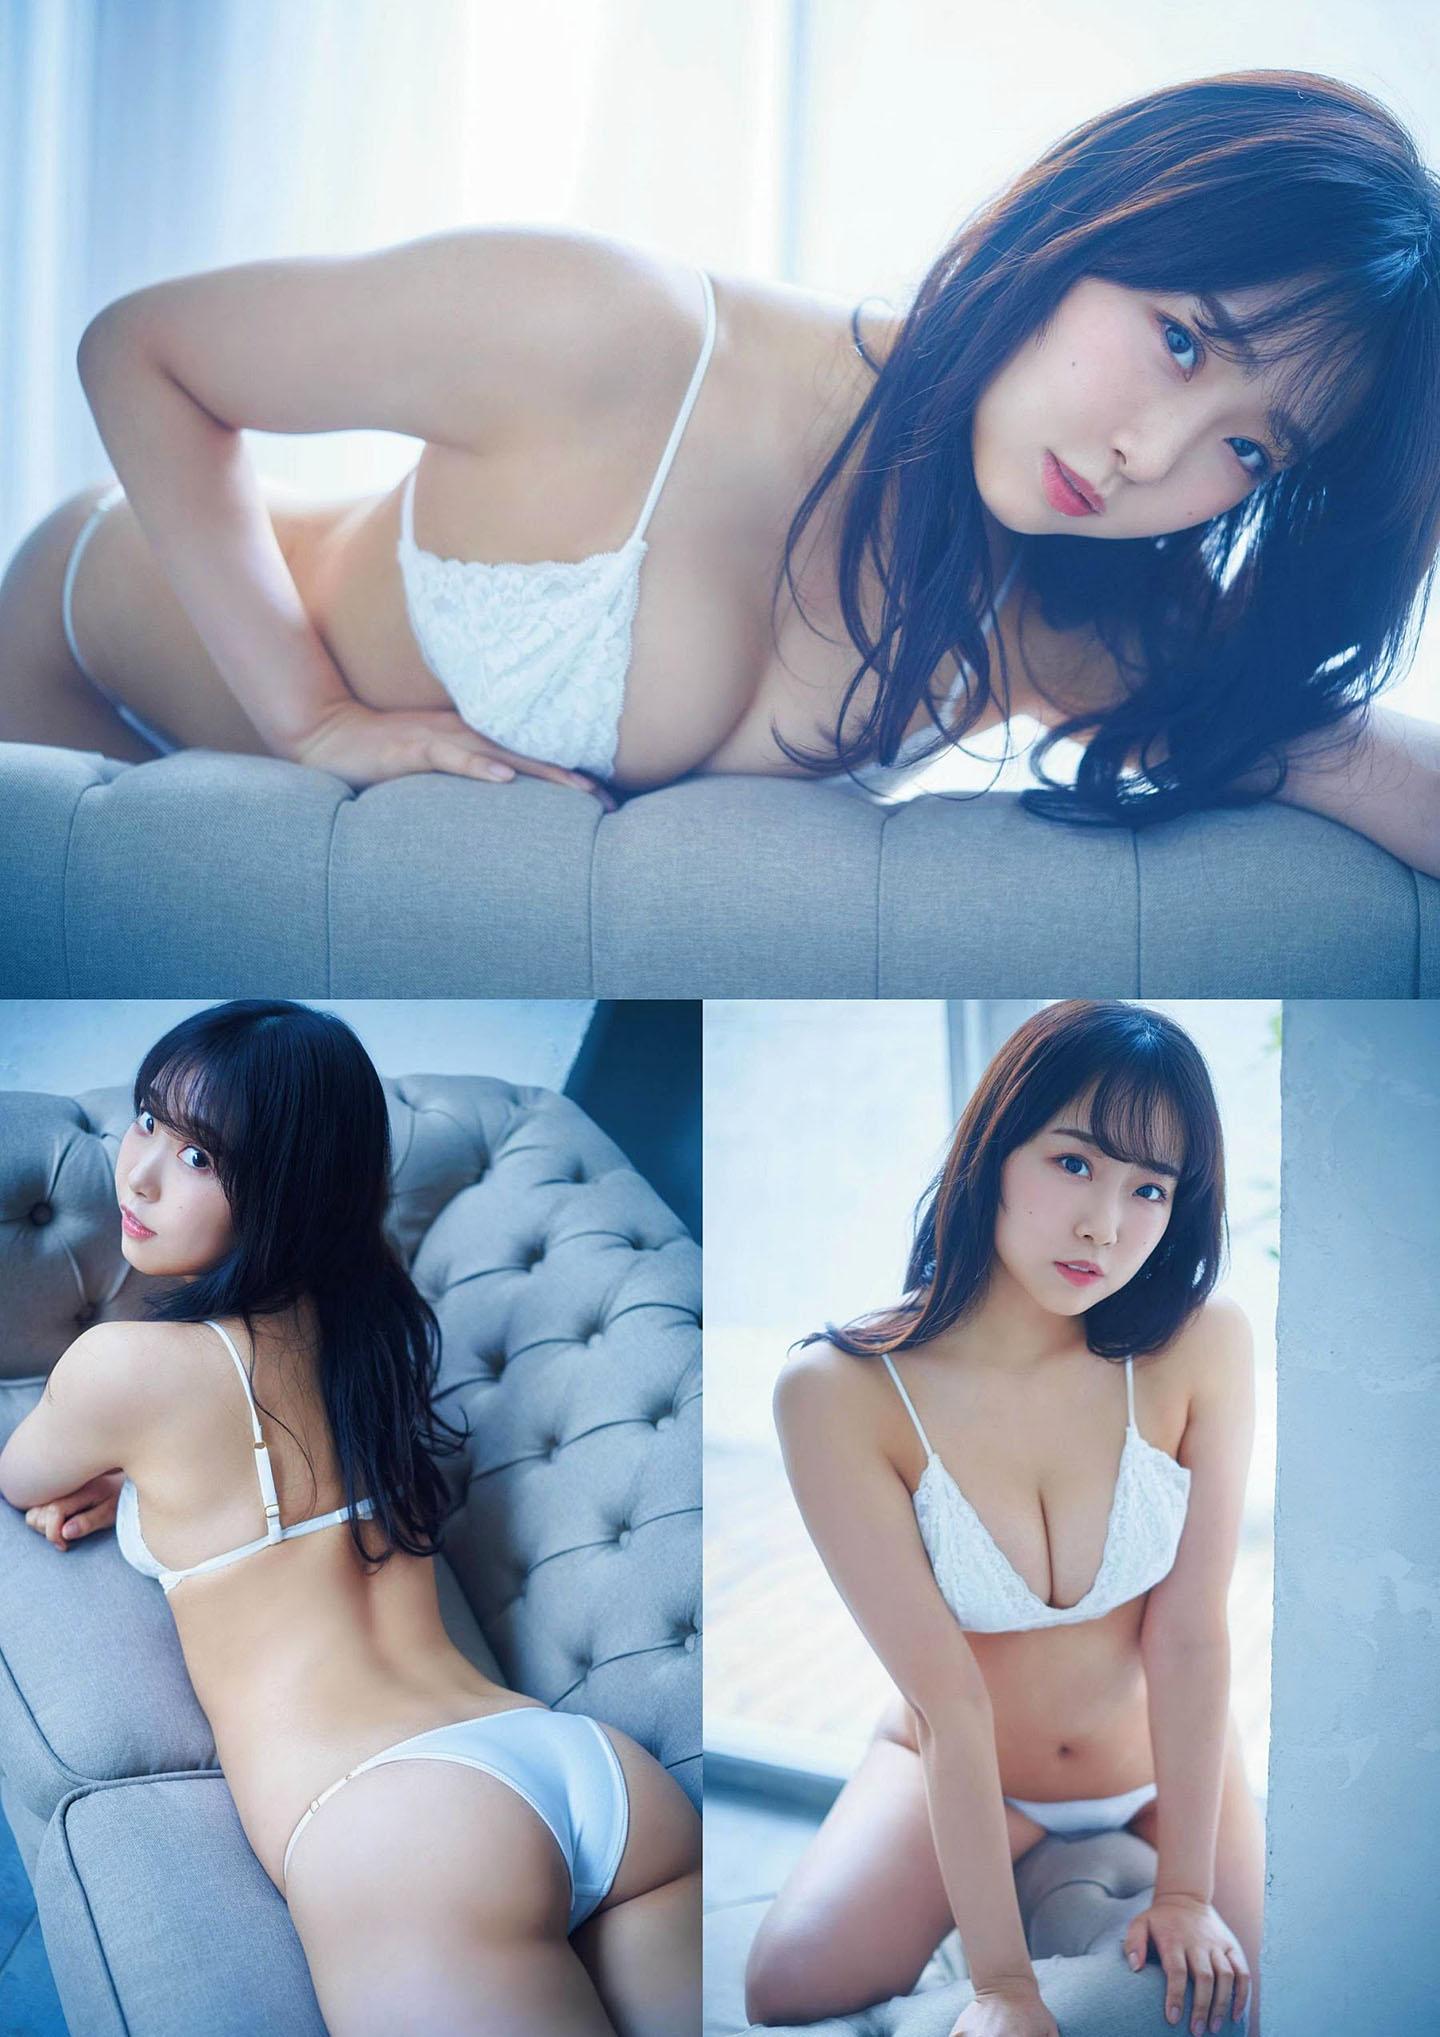 Yuuka Kato NMB48 EnTame 210304 02.jpg